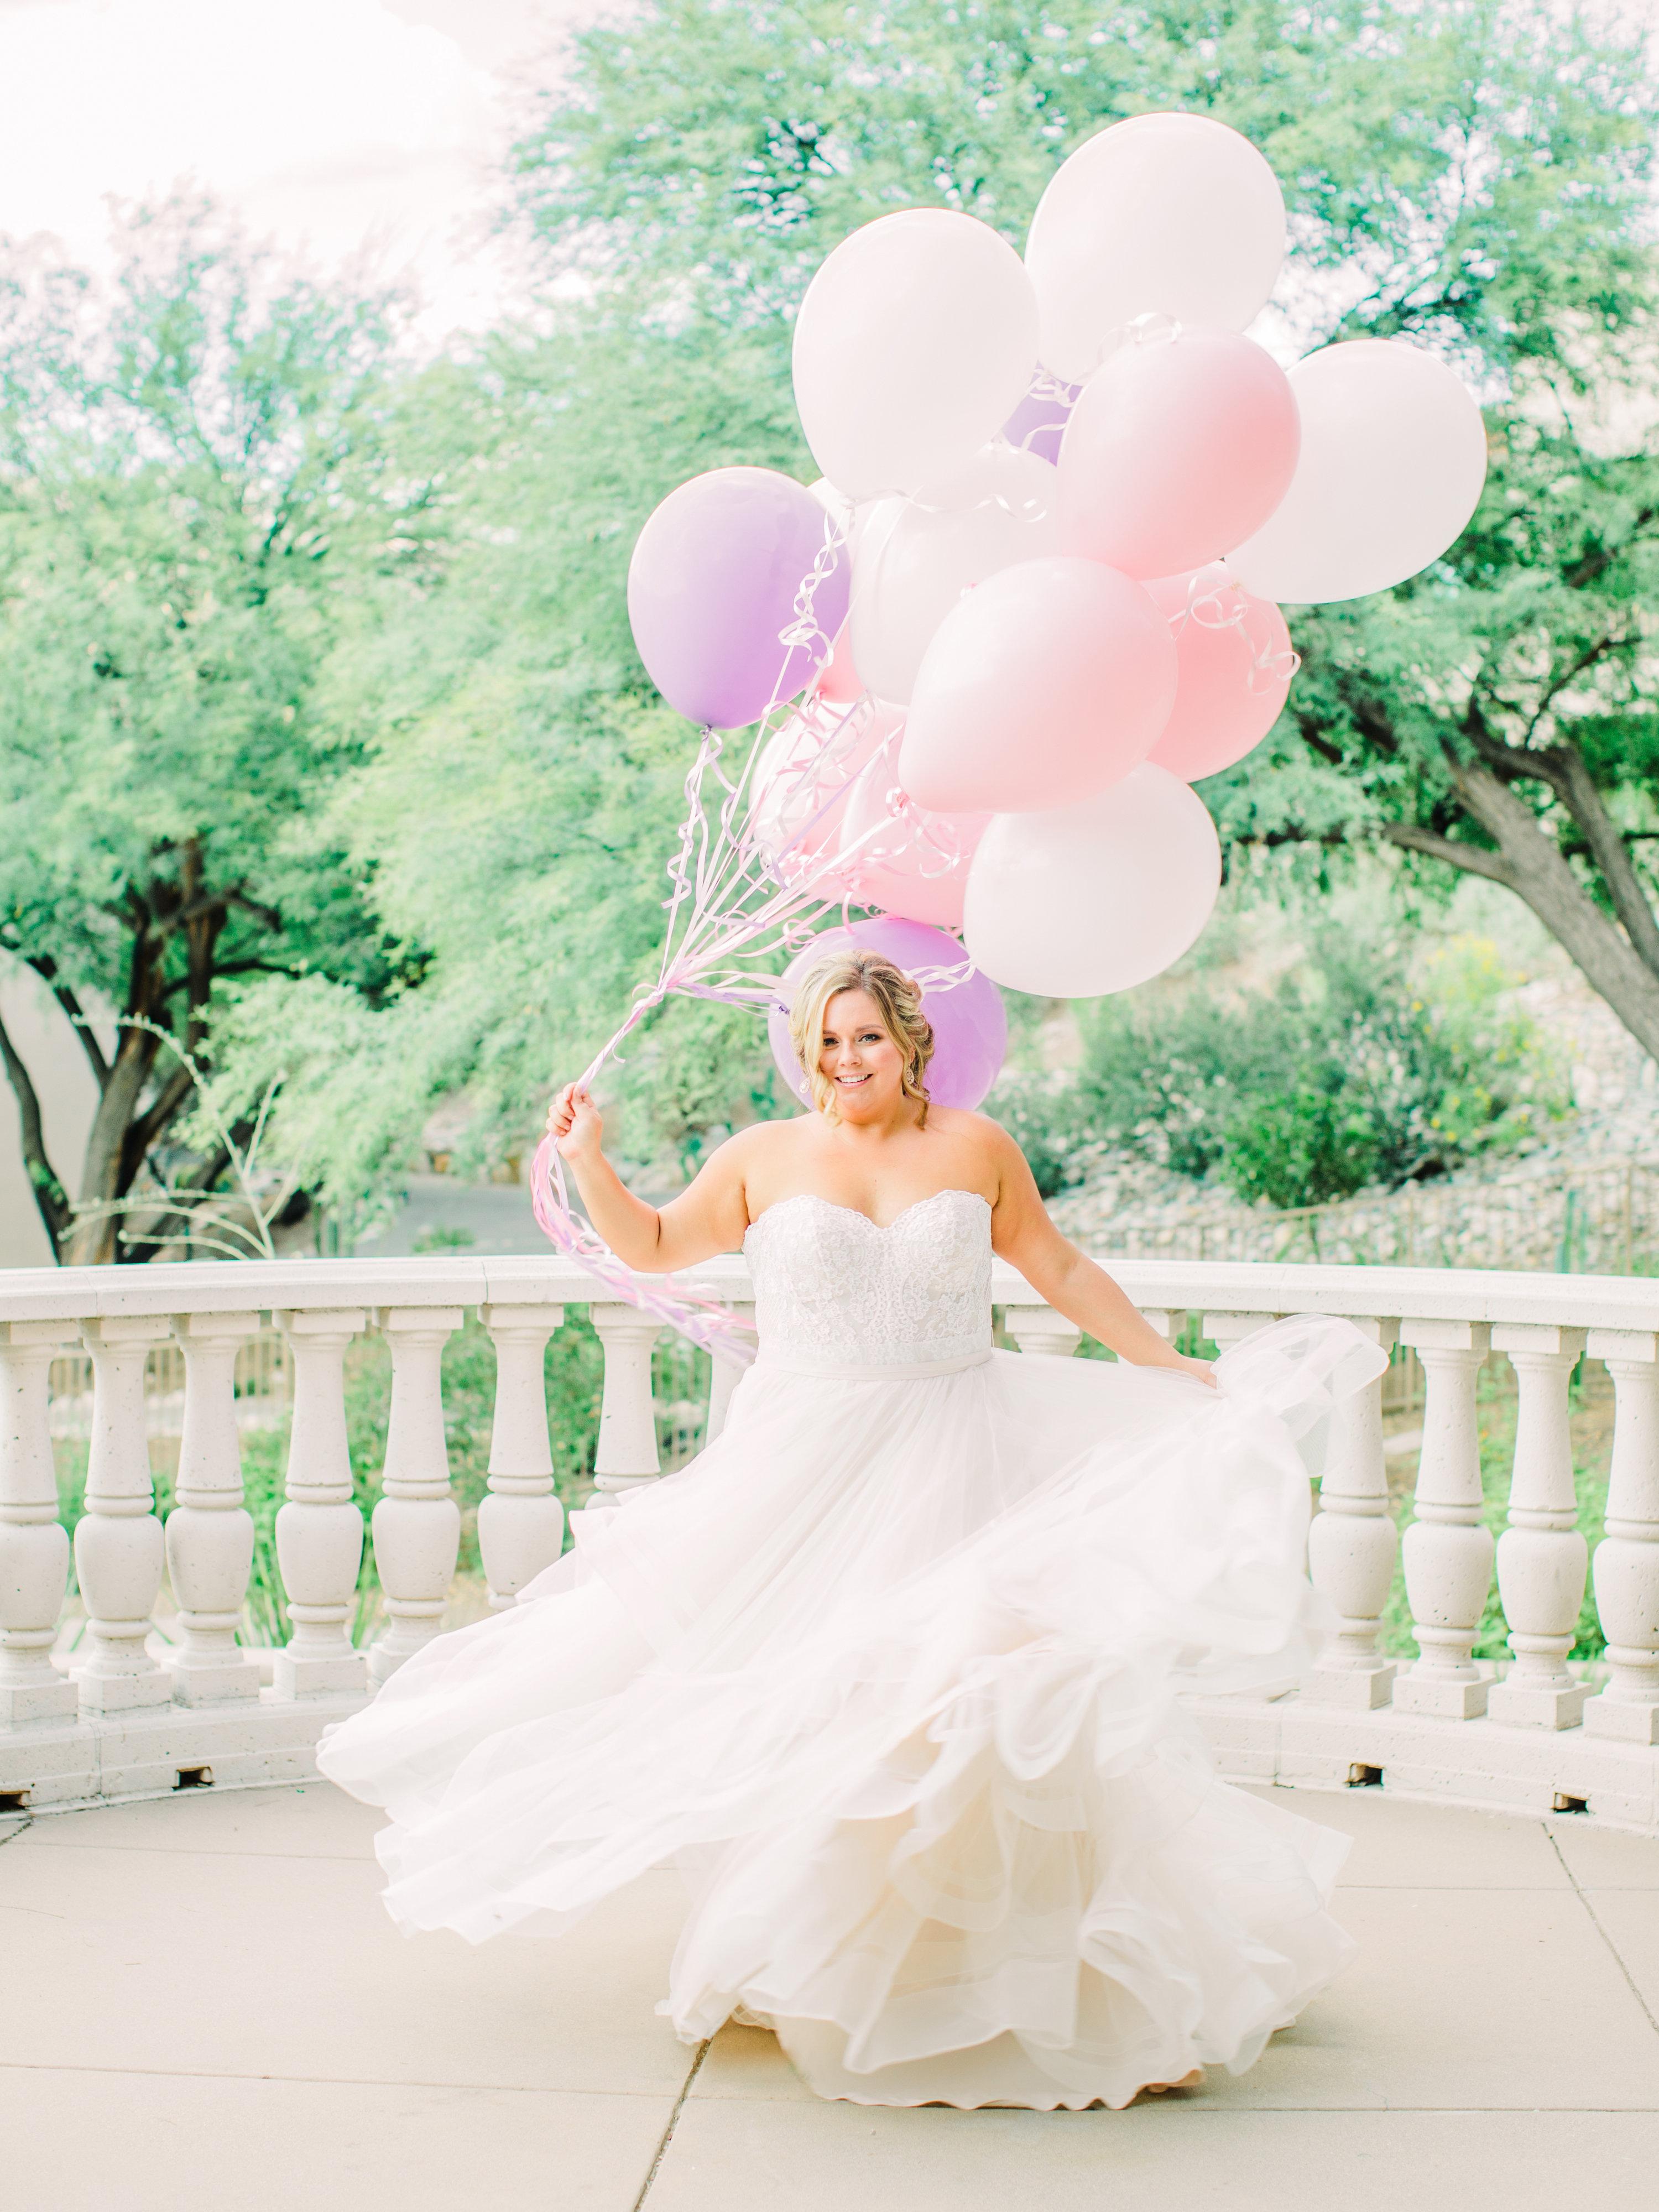 J Bridal Shoot-J Bridal Proofs-0005